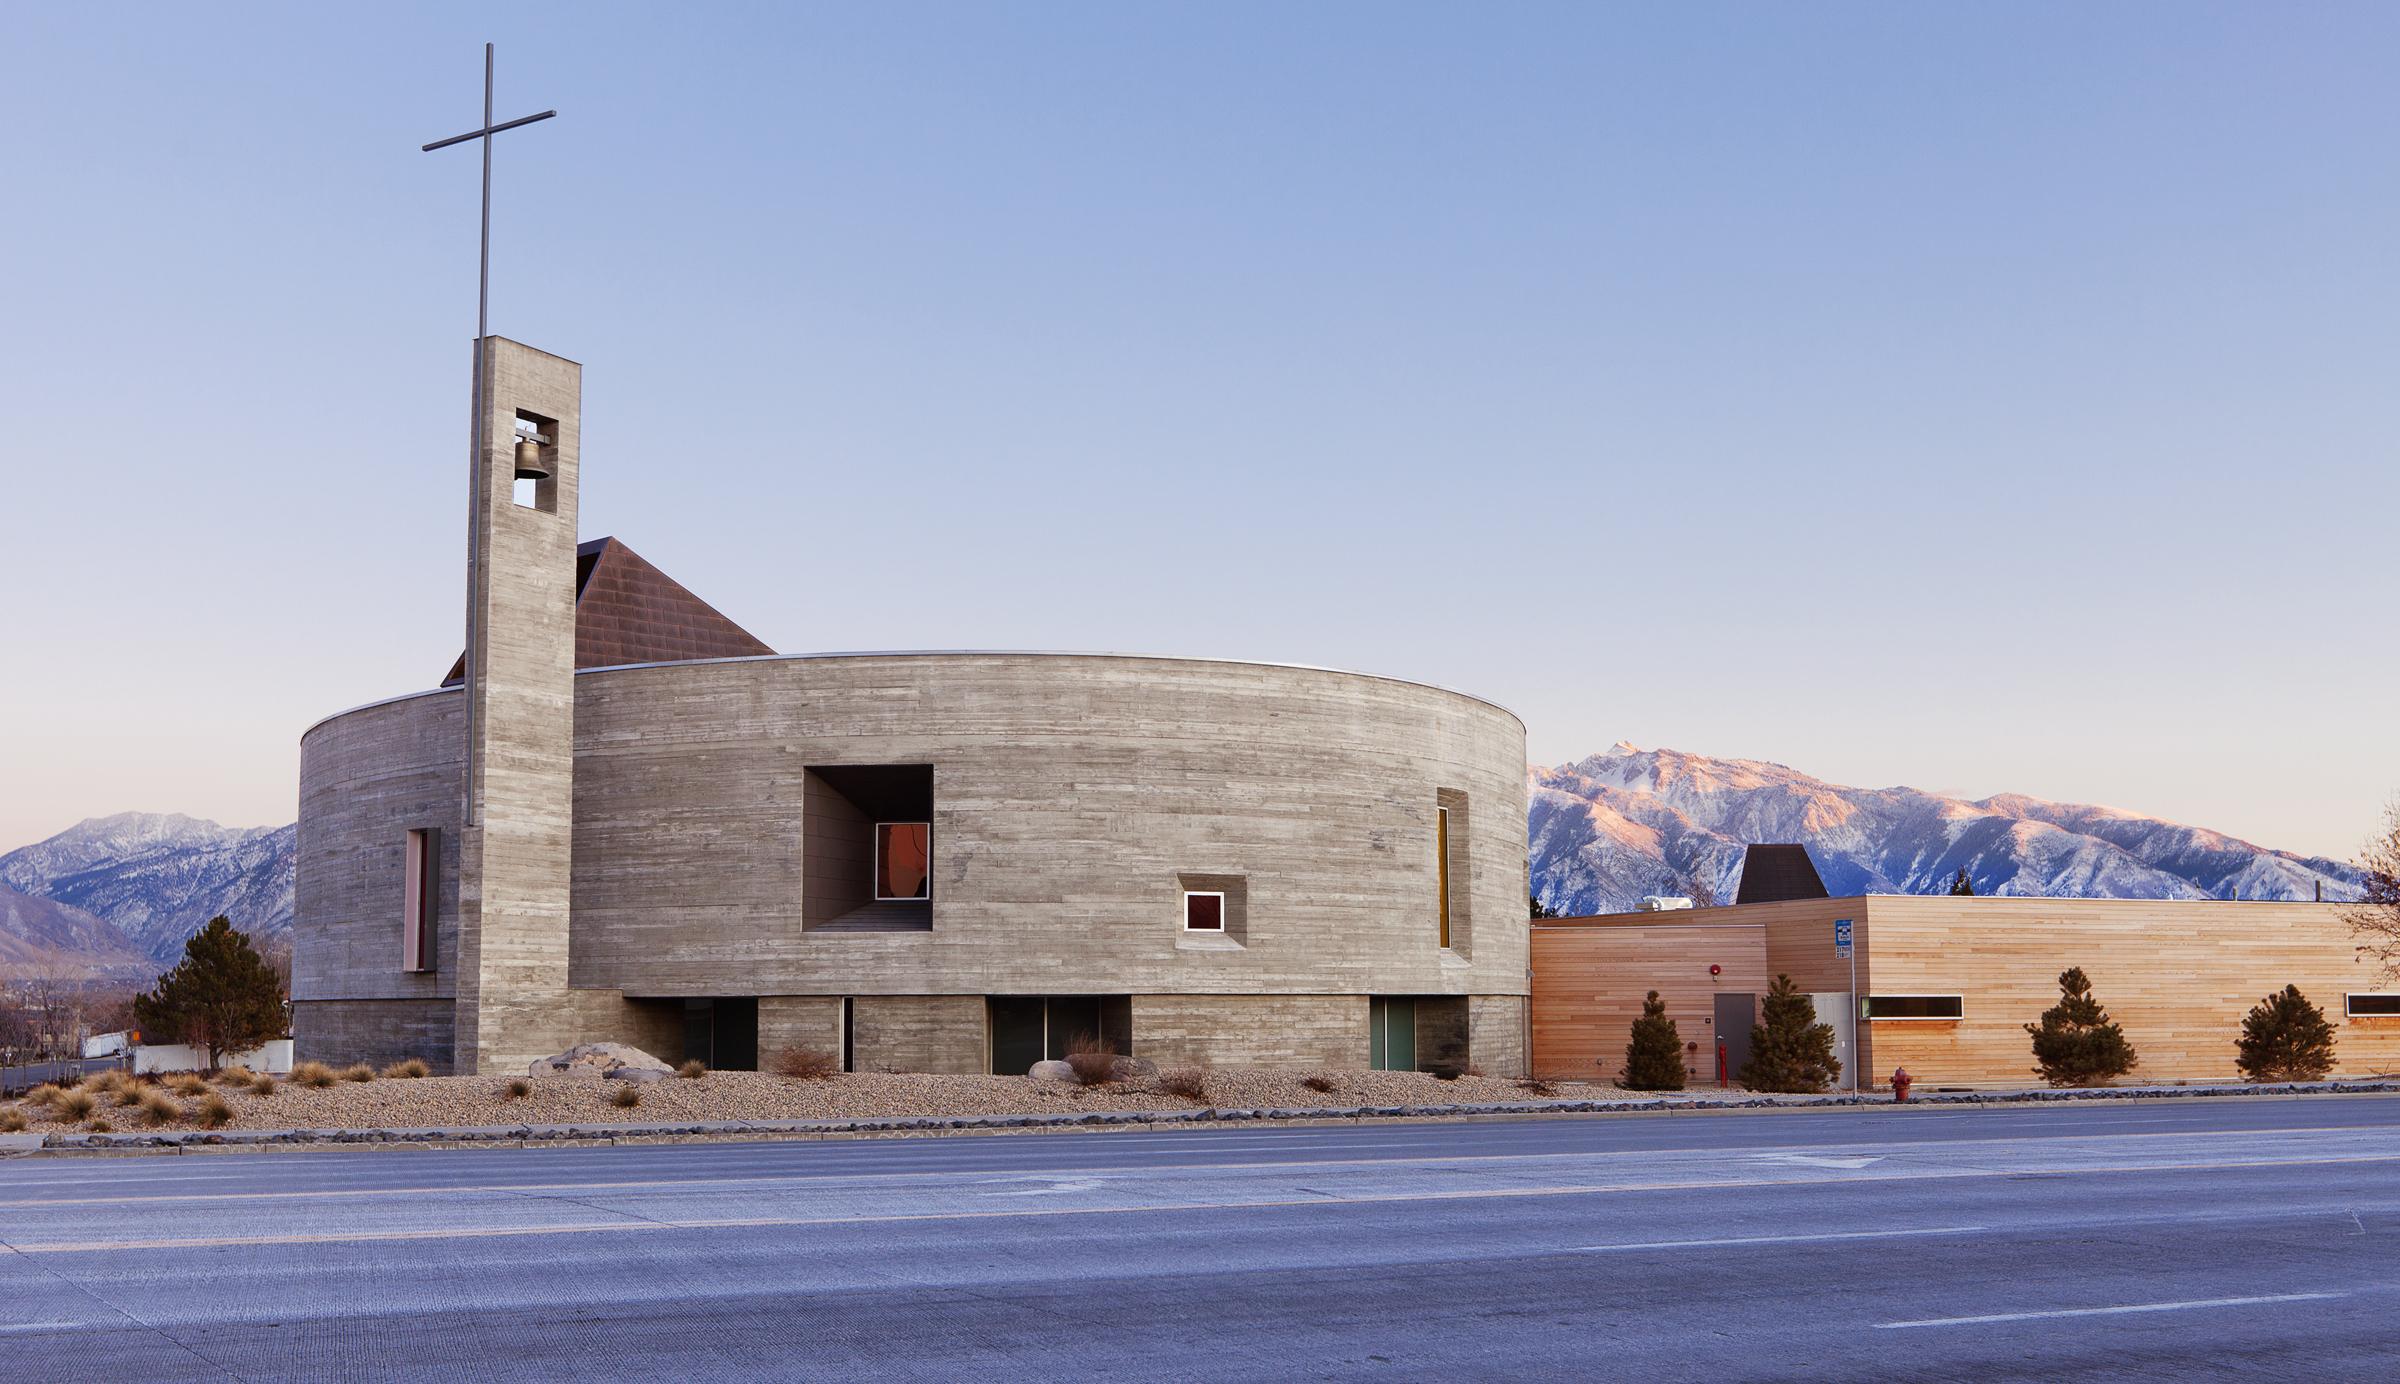 SAINT JOSEPH THE WORKER CATHOLIC CHURCH